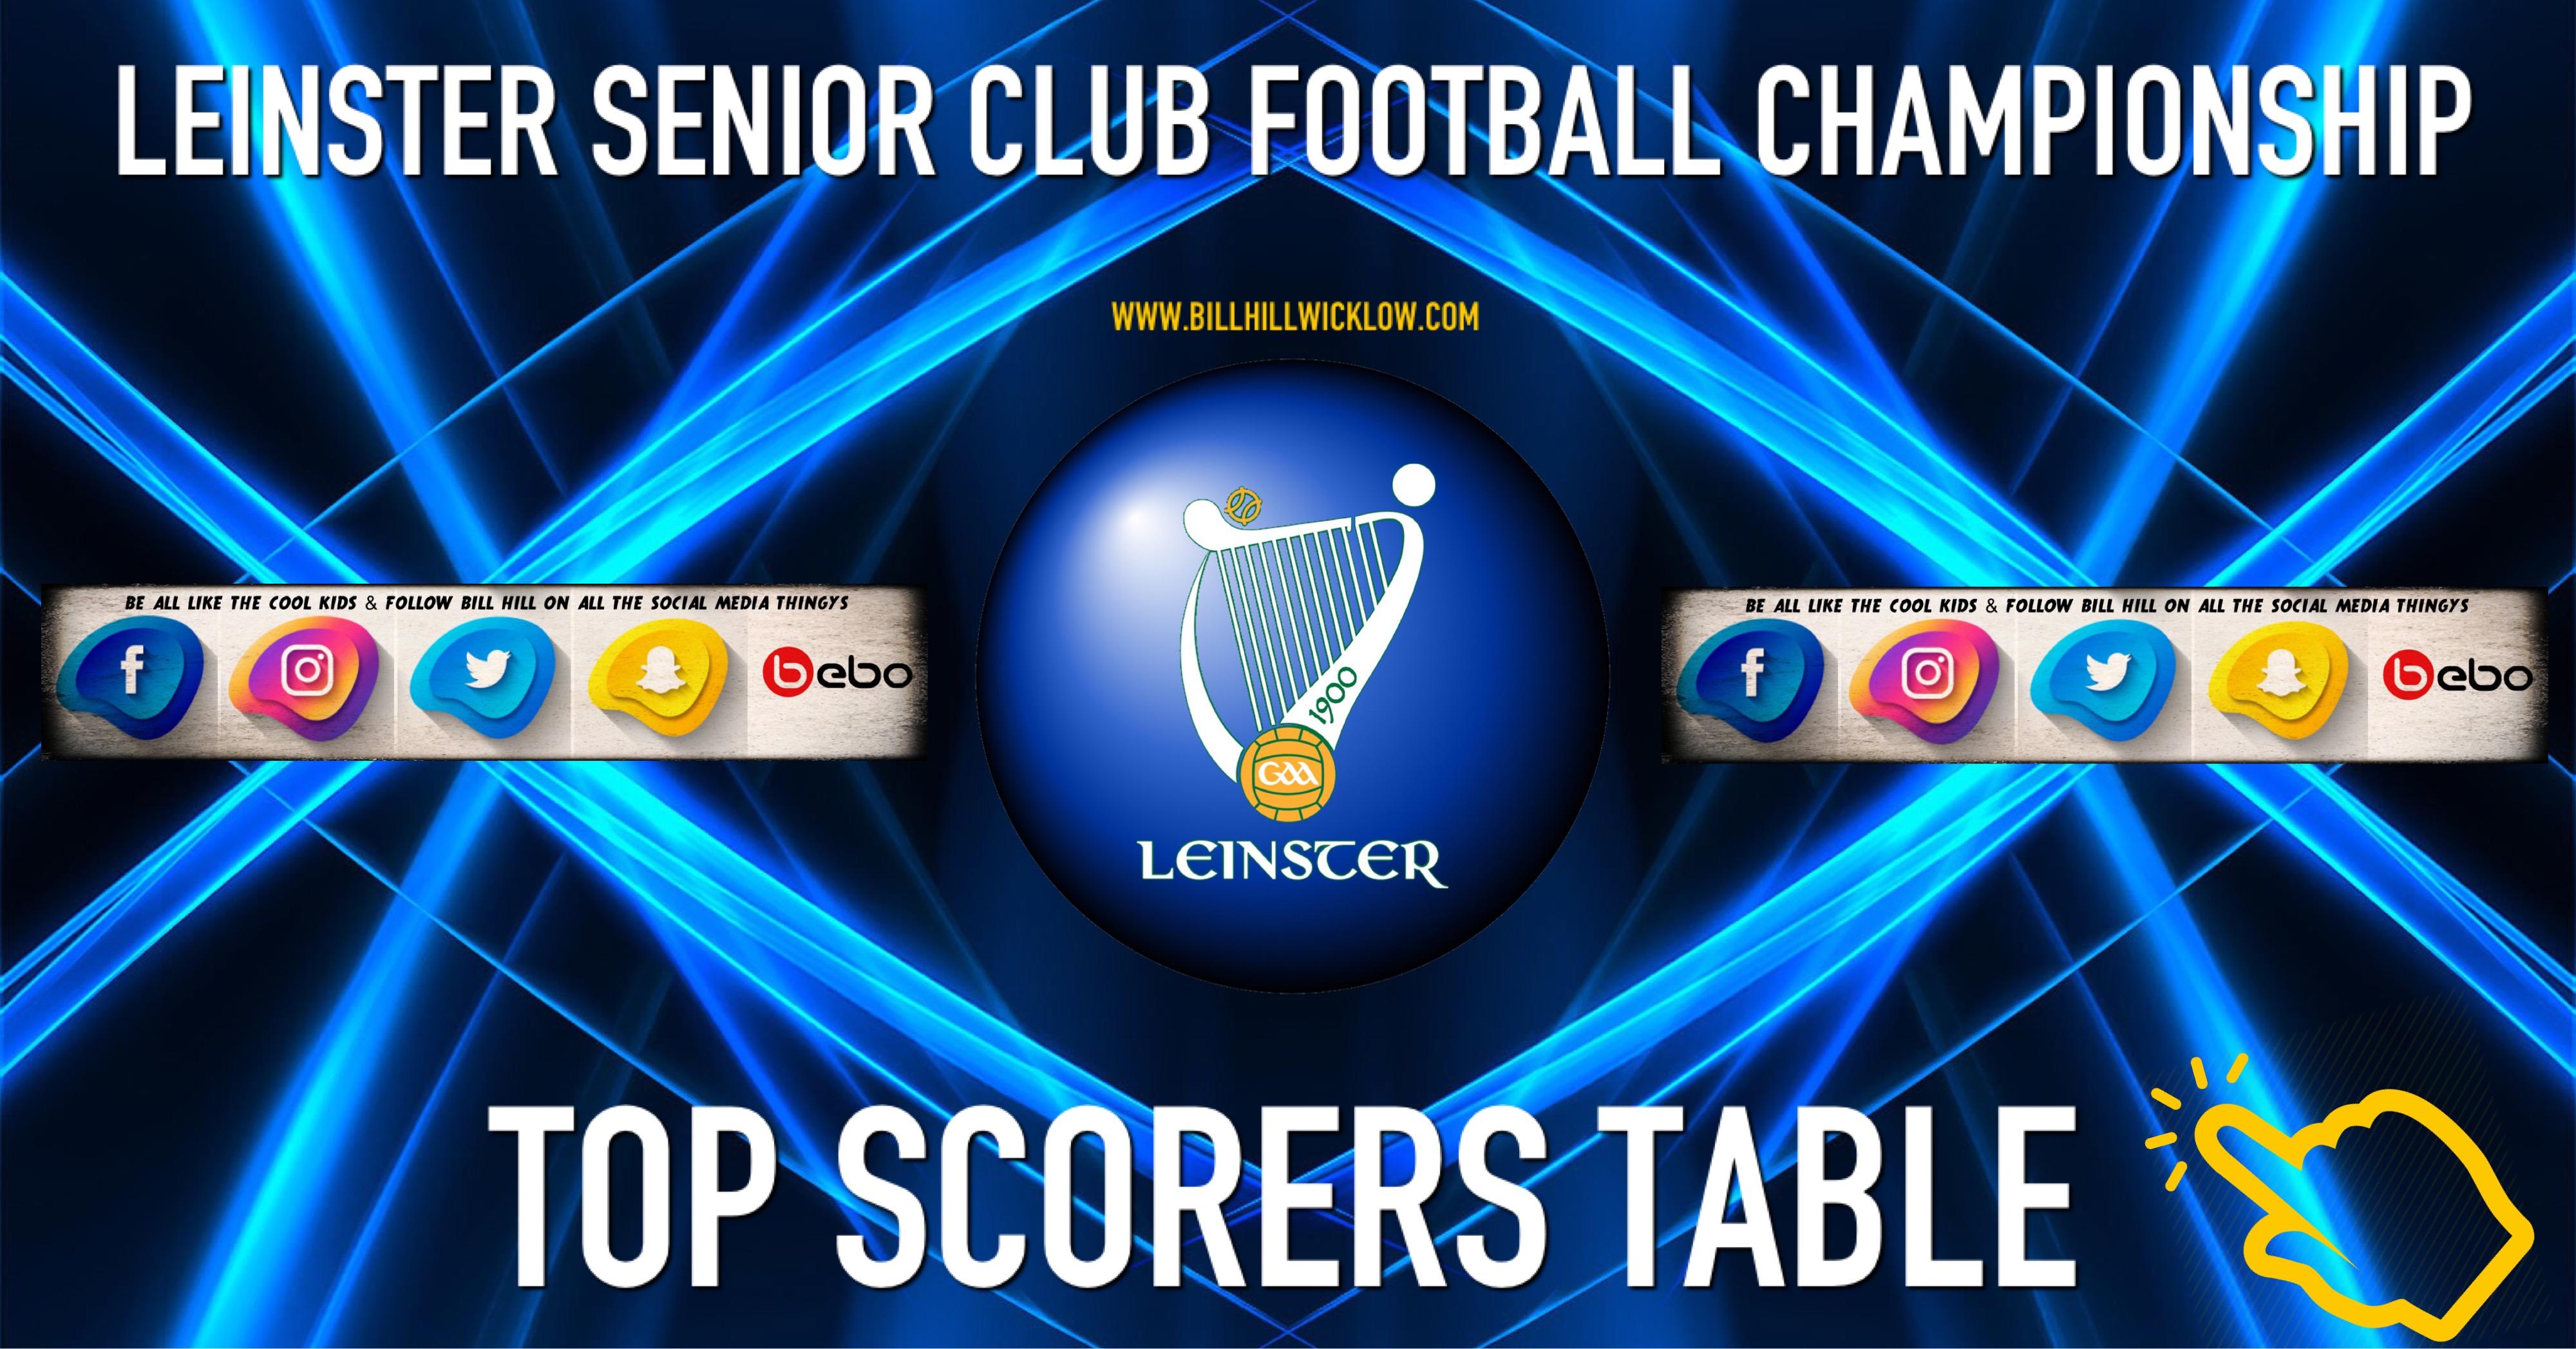 Leinster Club Senior Football Championship Top Scorer Table 2019